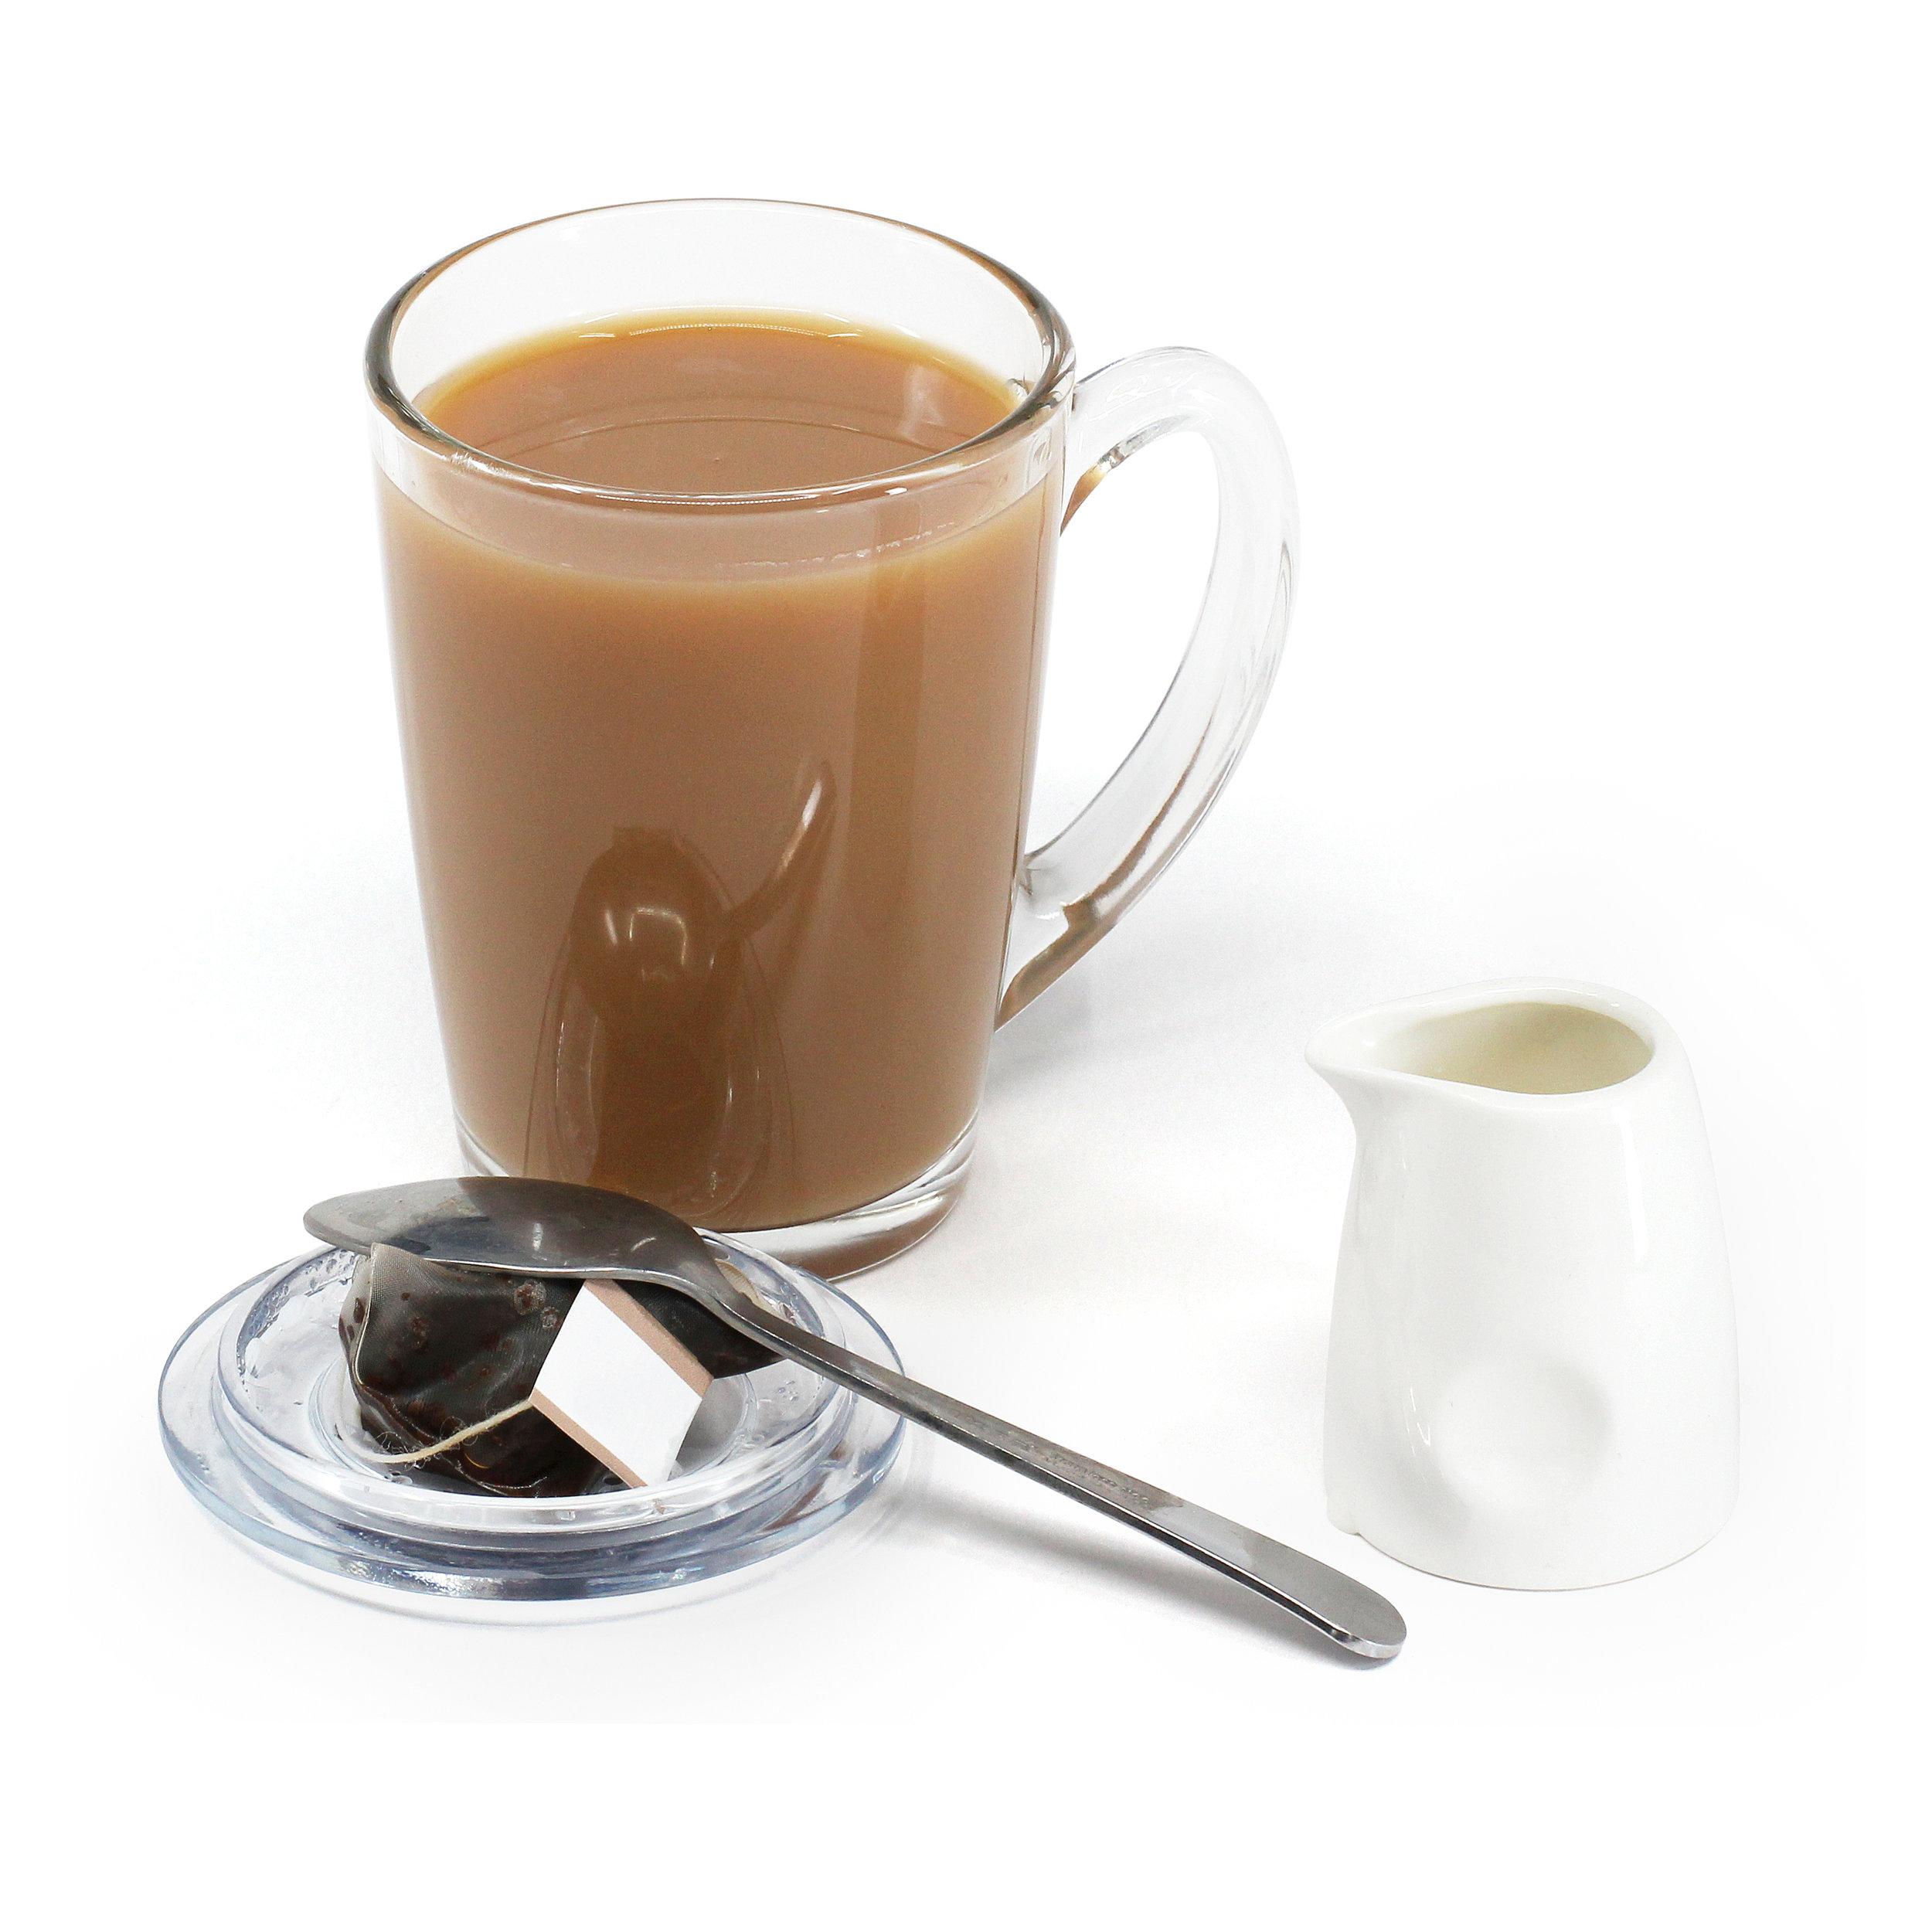 TEAPY® T-4-1™ | Glass Mug | Ceramic Jug | Spoon